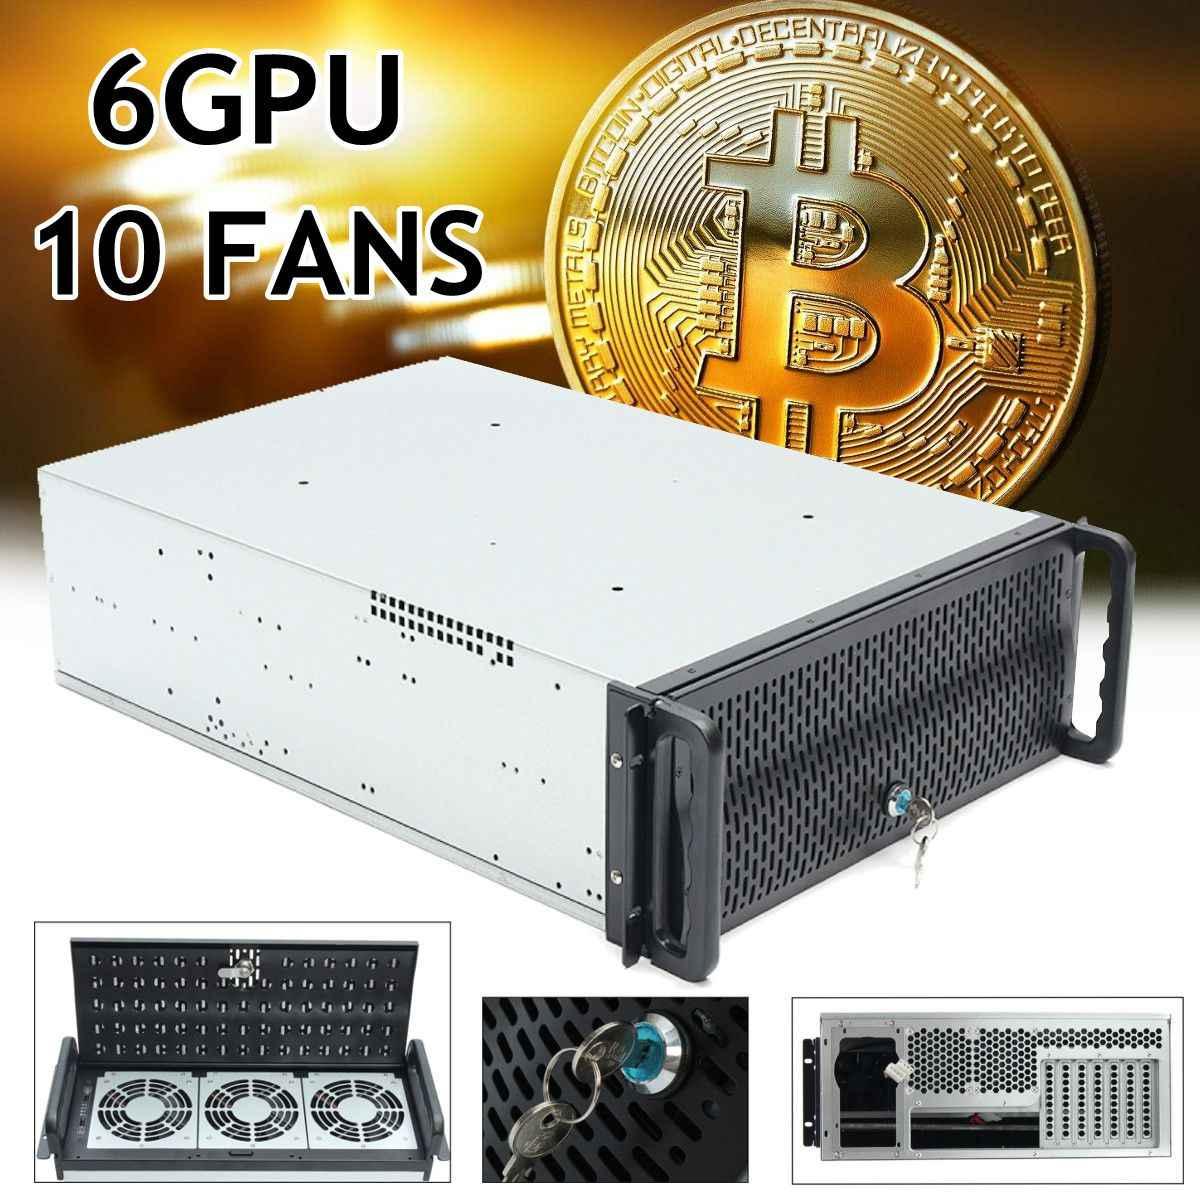 6 GPU 4U Rackmount Miner Mining Frame Mining Server Case with 10 FANS Rsiers Frame Rig